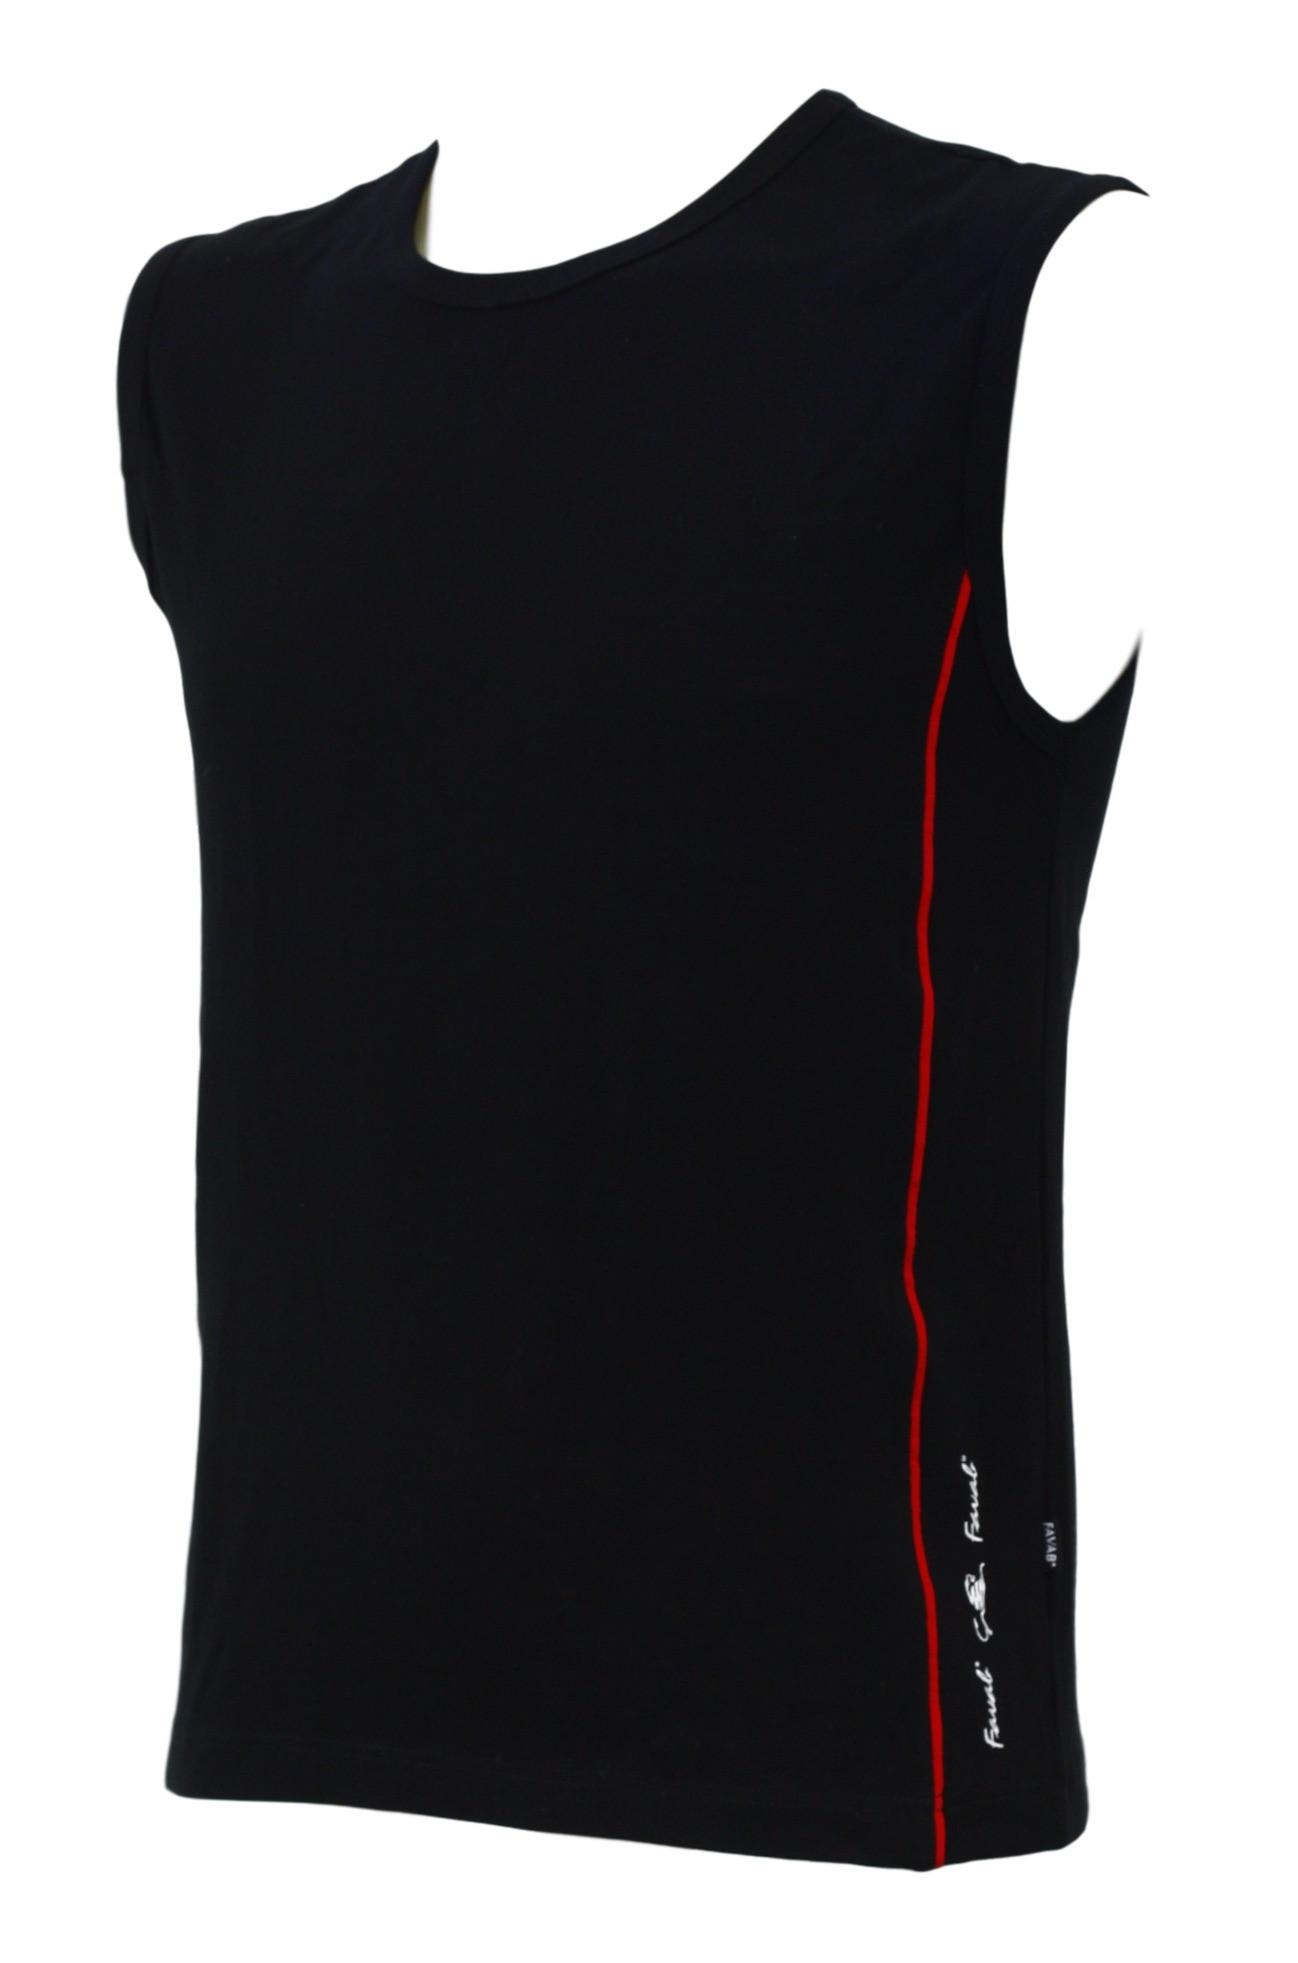 Pánské tričko Dep - Favab bez rukávu Barva: černá, Velikost: M